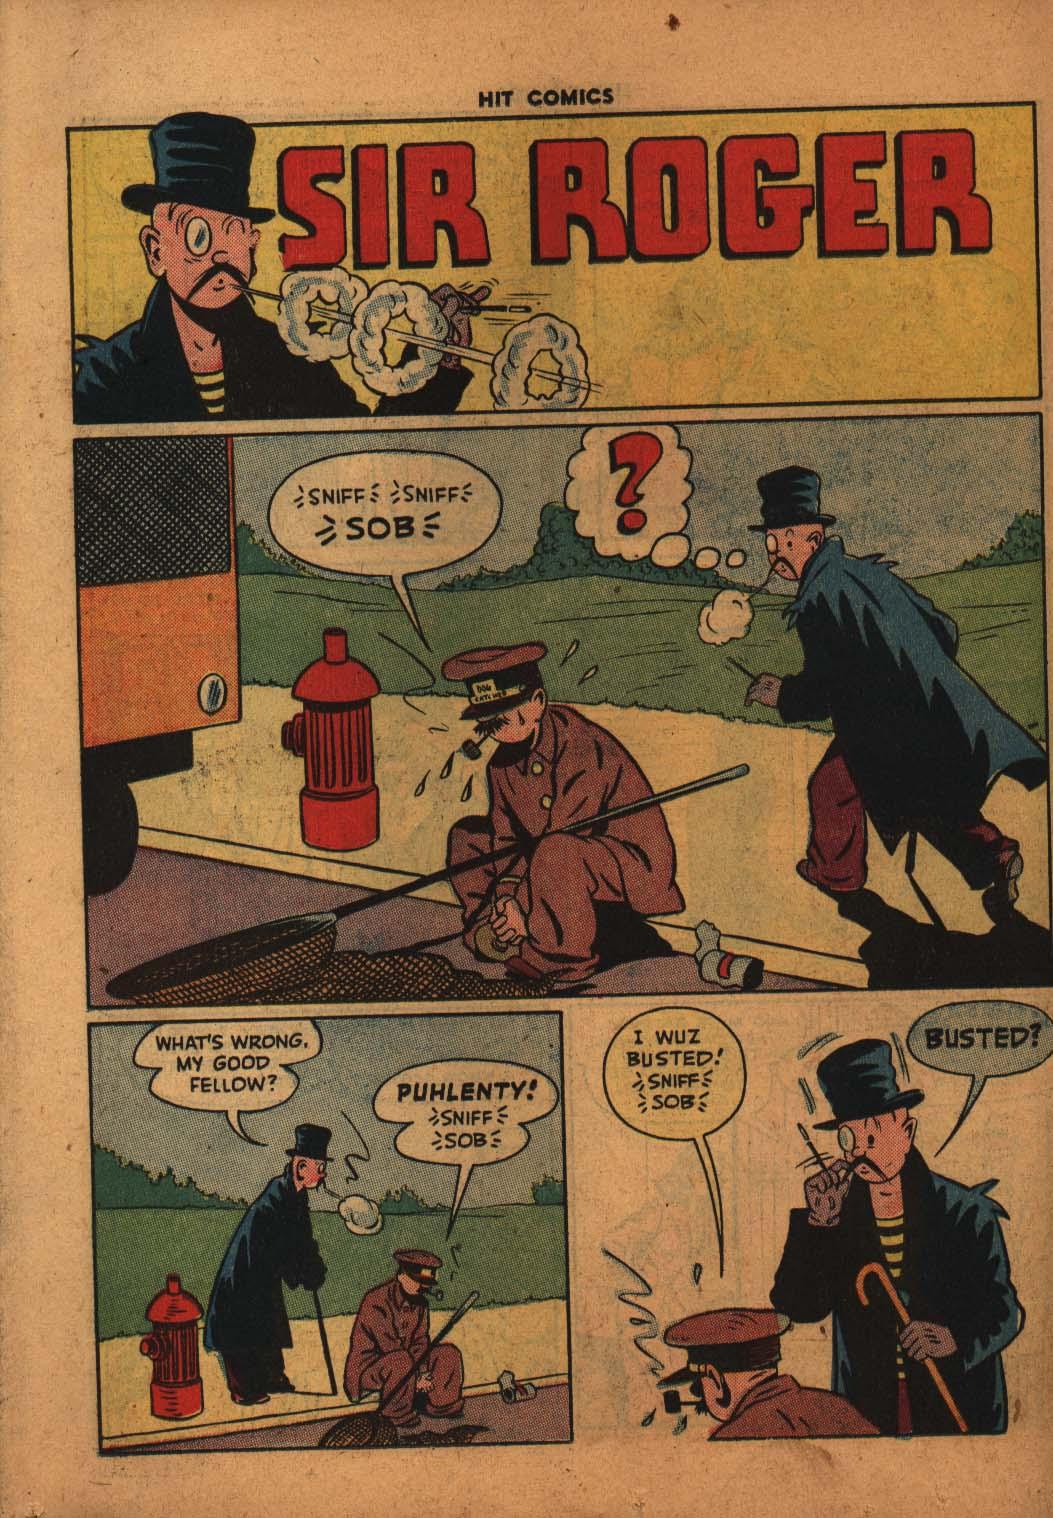 Read online Hit Comics comic -  Issue #47 - 31